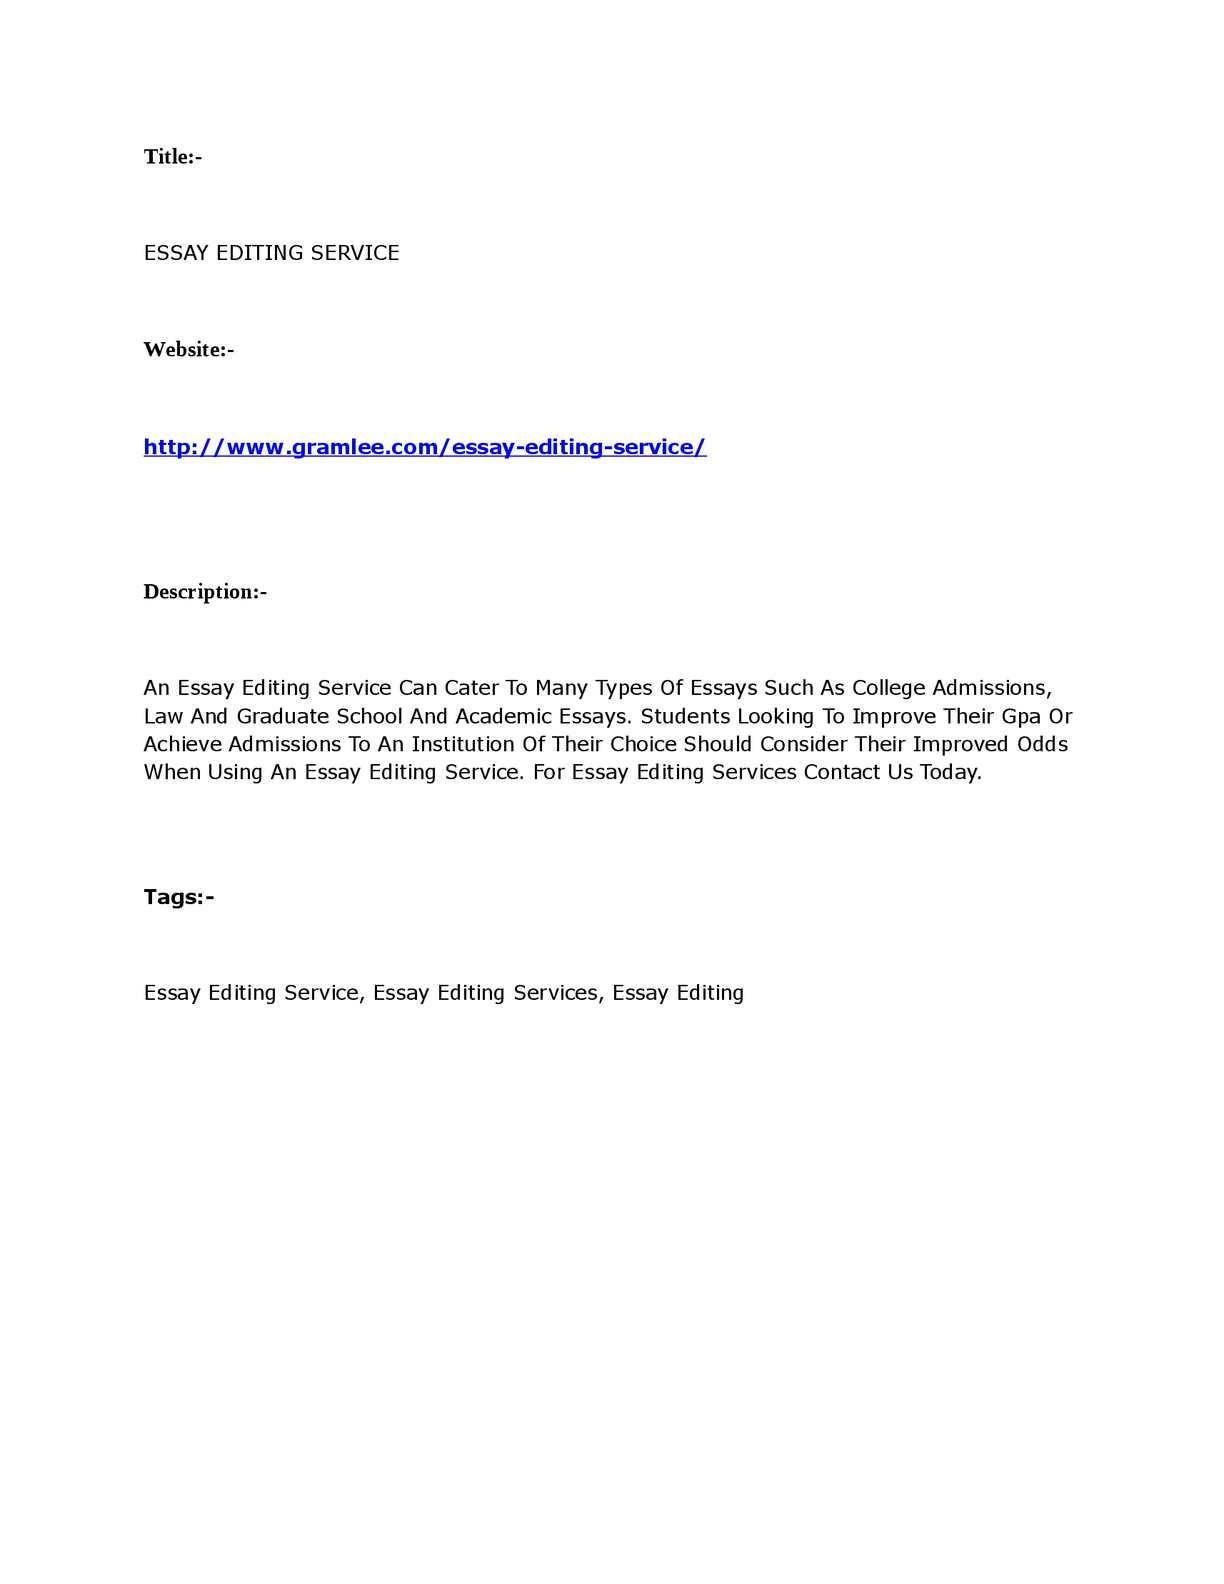 Graduate school essay editing service